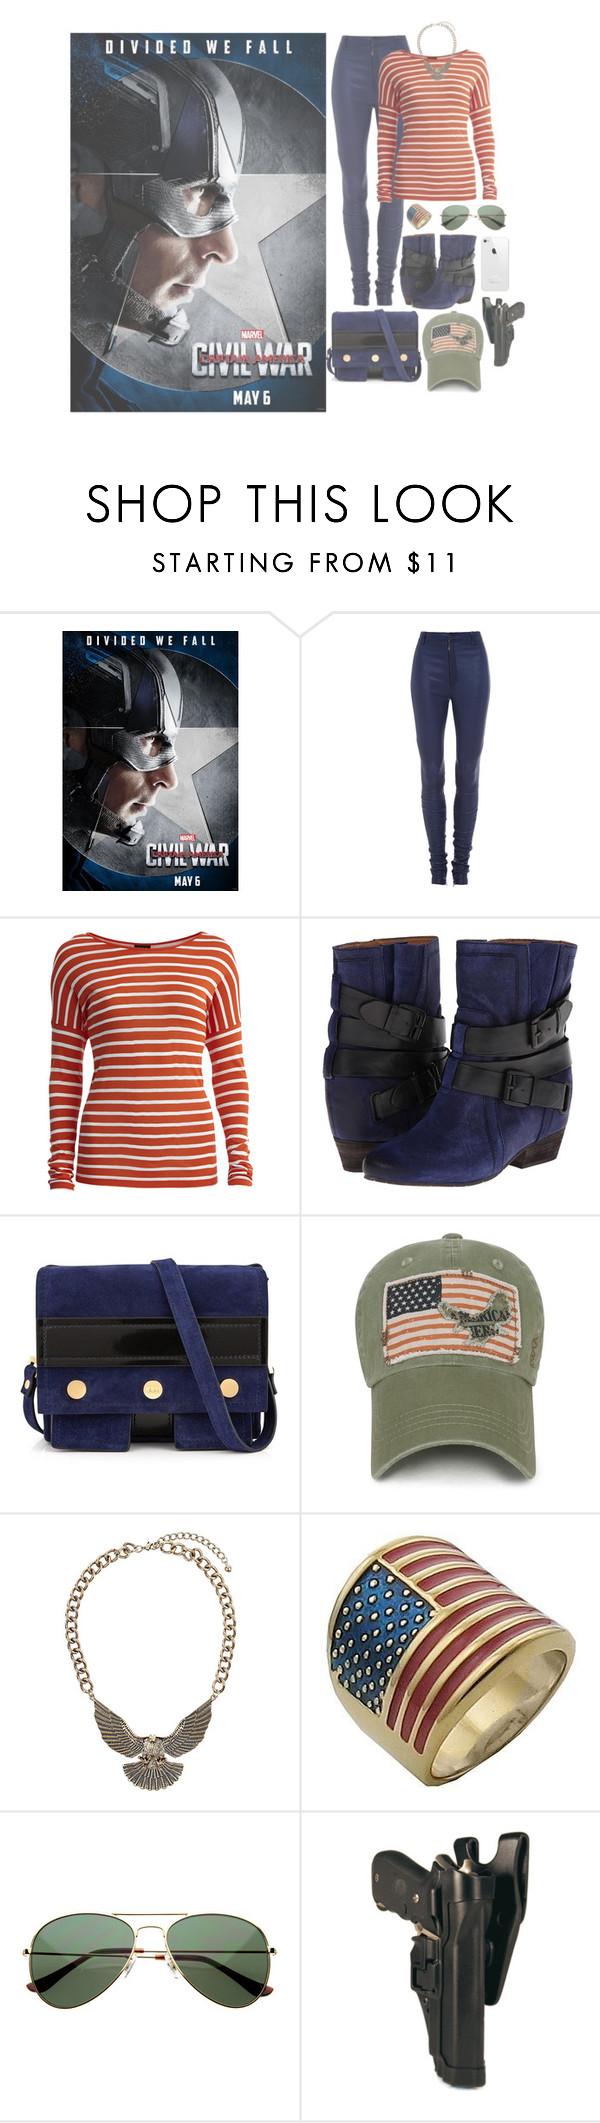 """Divided We Fall: Captain America"" by kingcrimson ❤ liked on Polyvore featuring Rodarte, VILA, Naya, Kenzo, Topshop, Lauren Conrad, CaptainAmerica, steverogers, TeamCap and TeamCaptainAmerica"